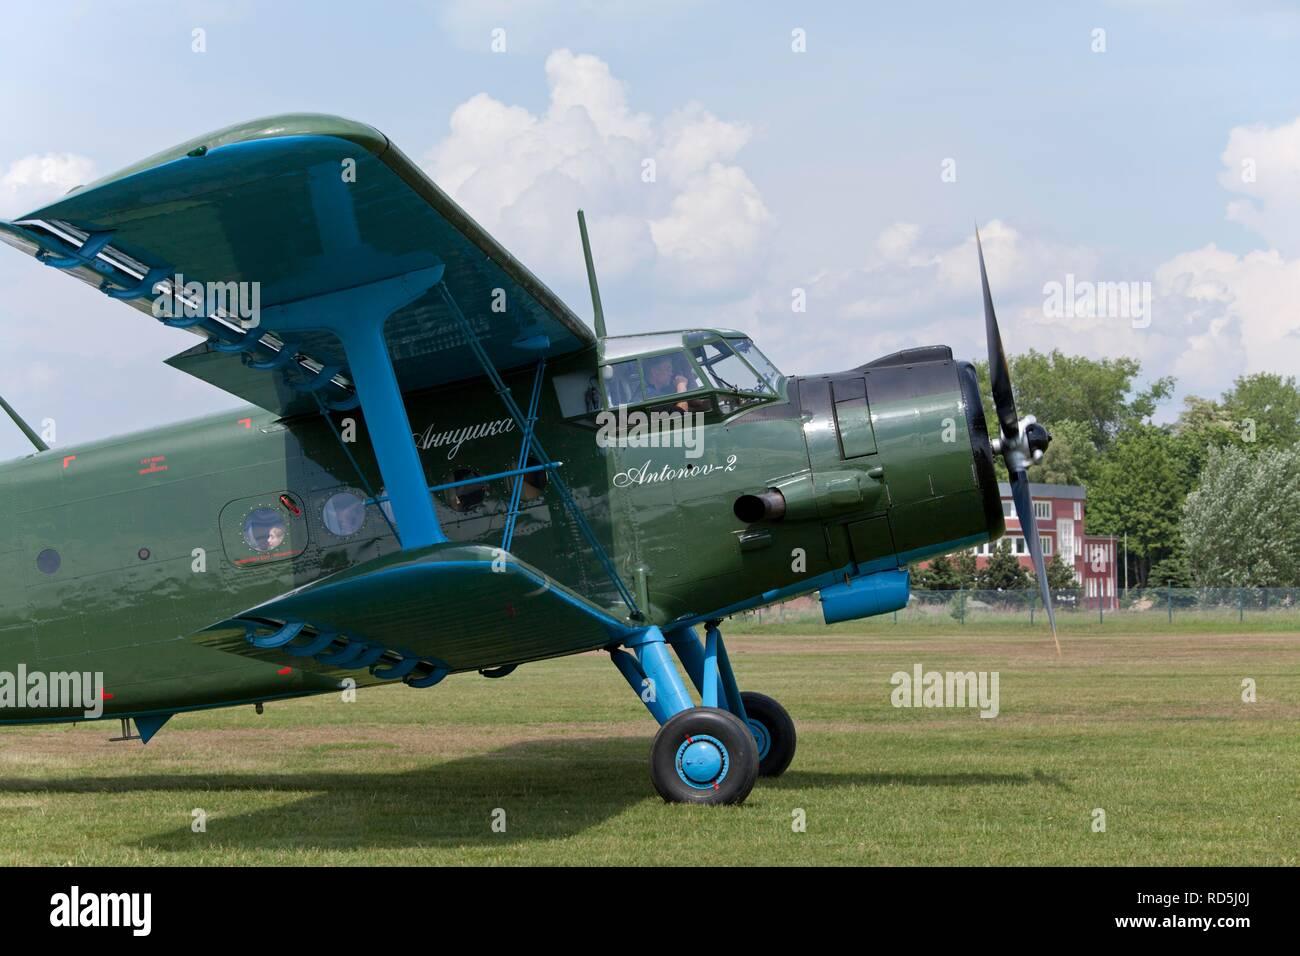 Antonov-2 biplane, celebration of the 100th anniversary of the airfield, in Lueneburg, Lower Saxony, Germany Stock Photo